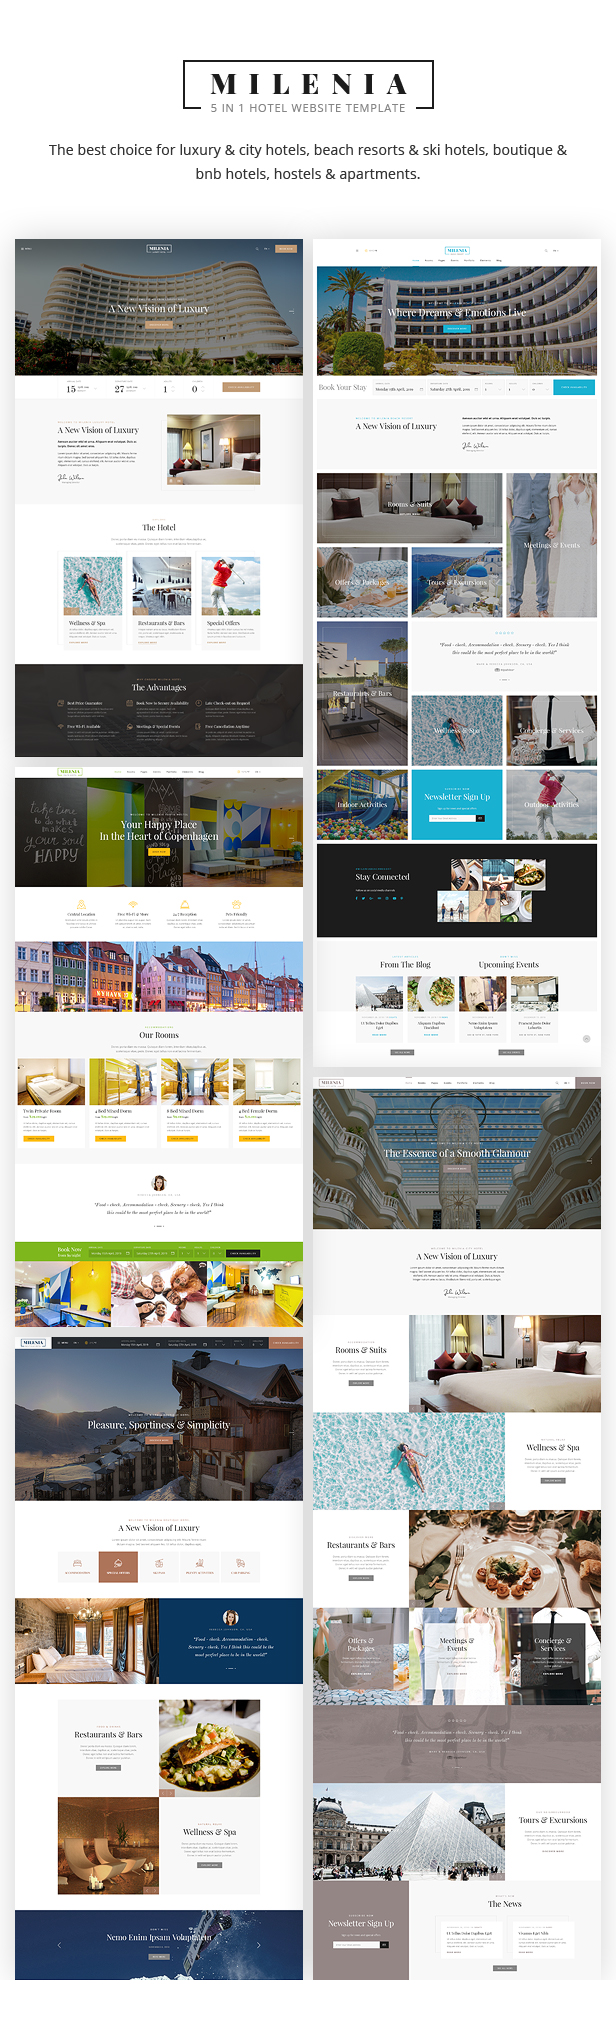 Milenia - Hotel & Resort Website Template - 1